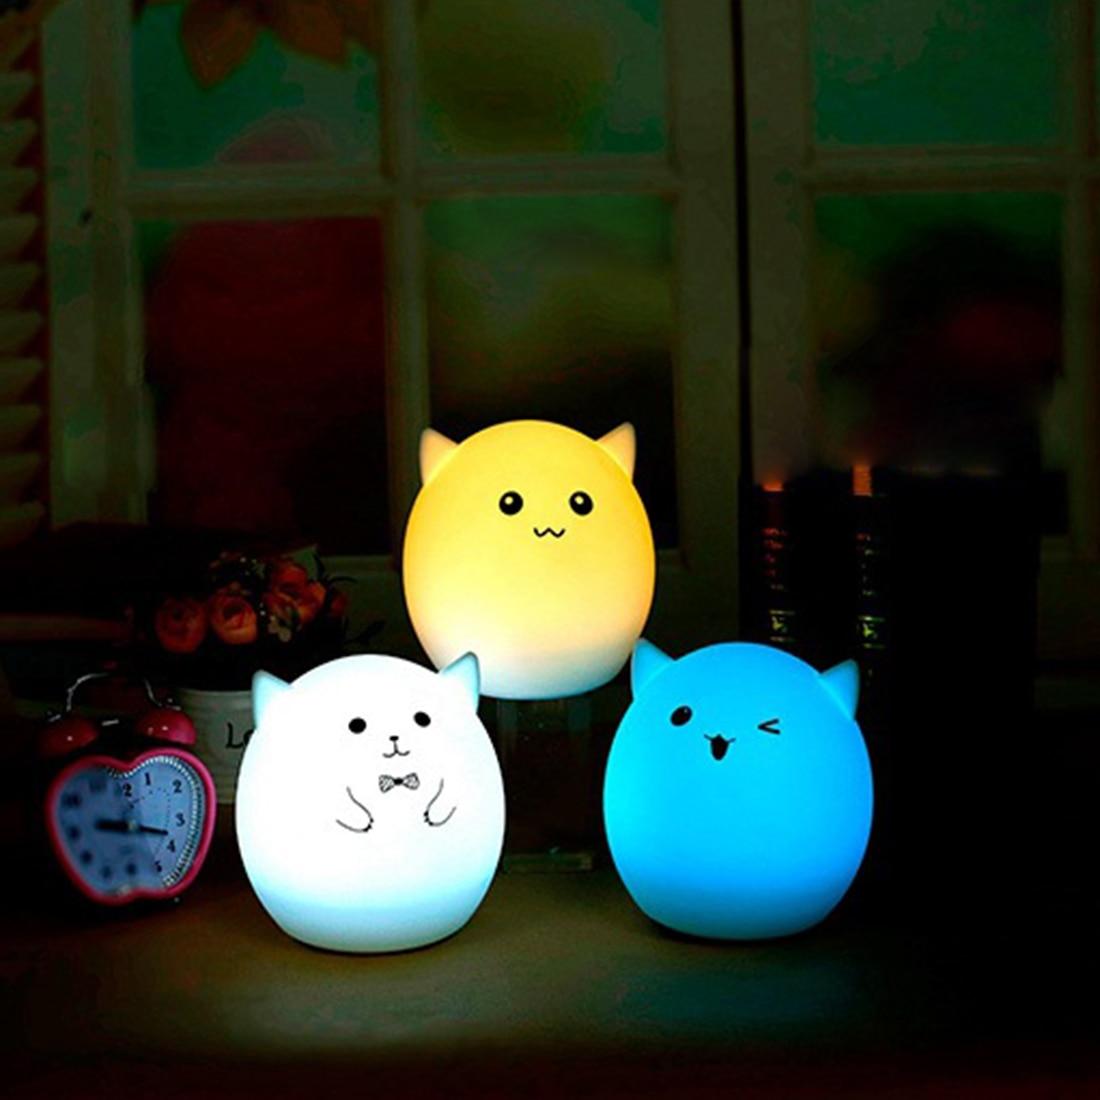 Night lights nursery - Animated Night Light Jpg 1100x1100 Cartoon Nursery Night Lights